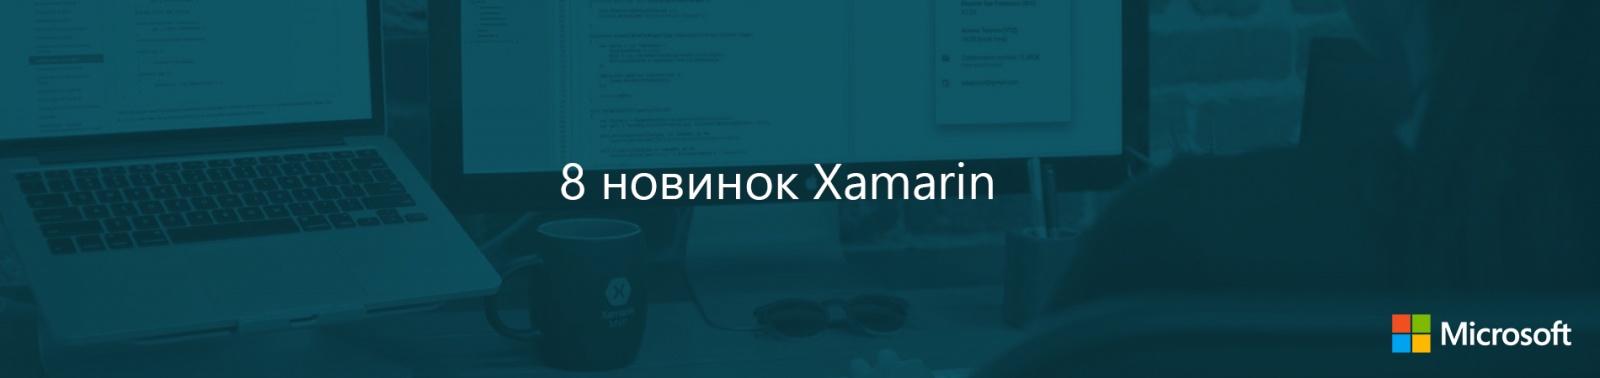 8 новинок Xamarin - 1